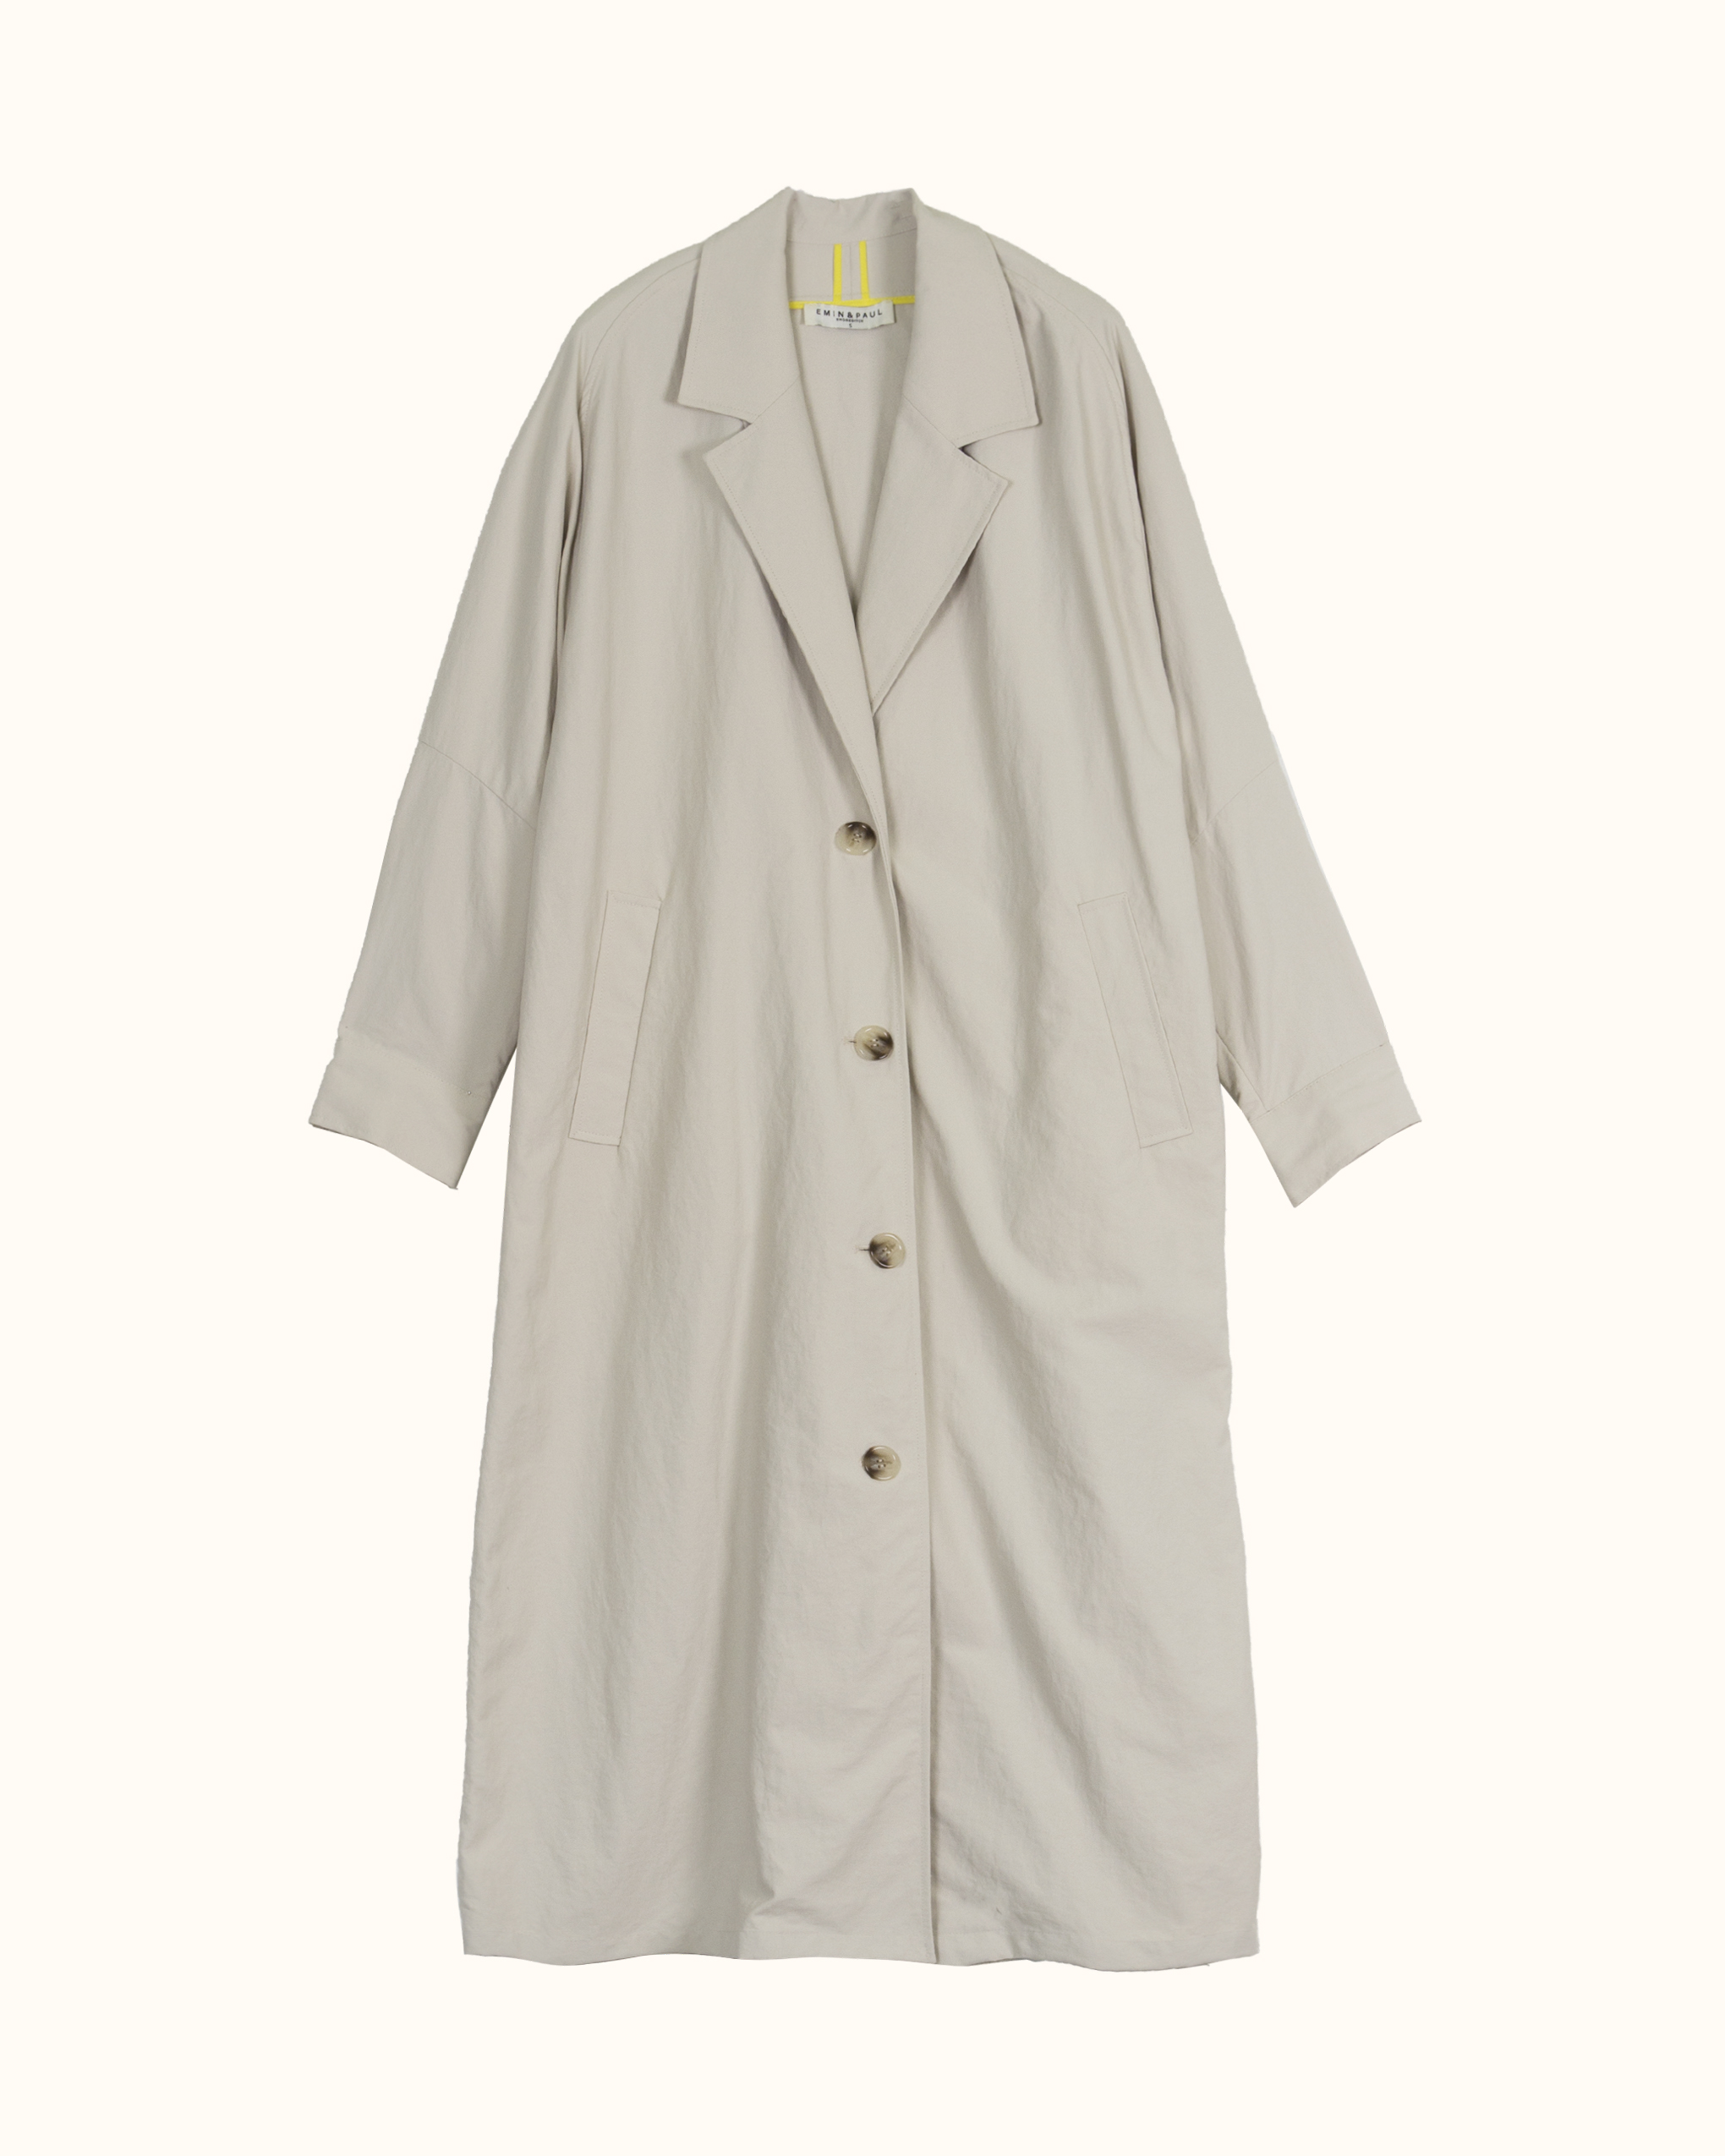 A off-white oversized coat.